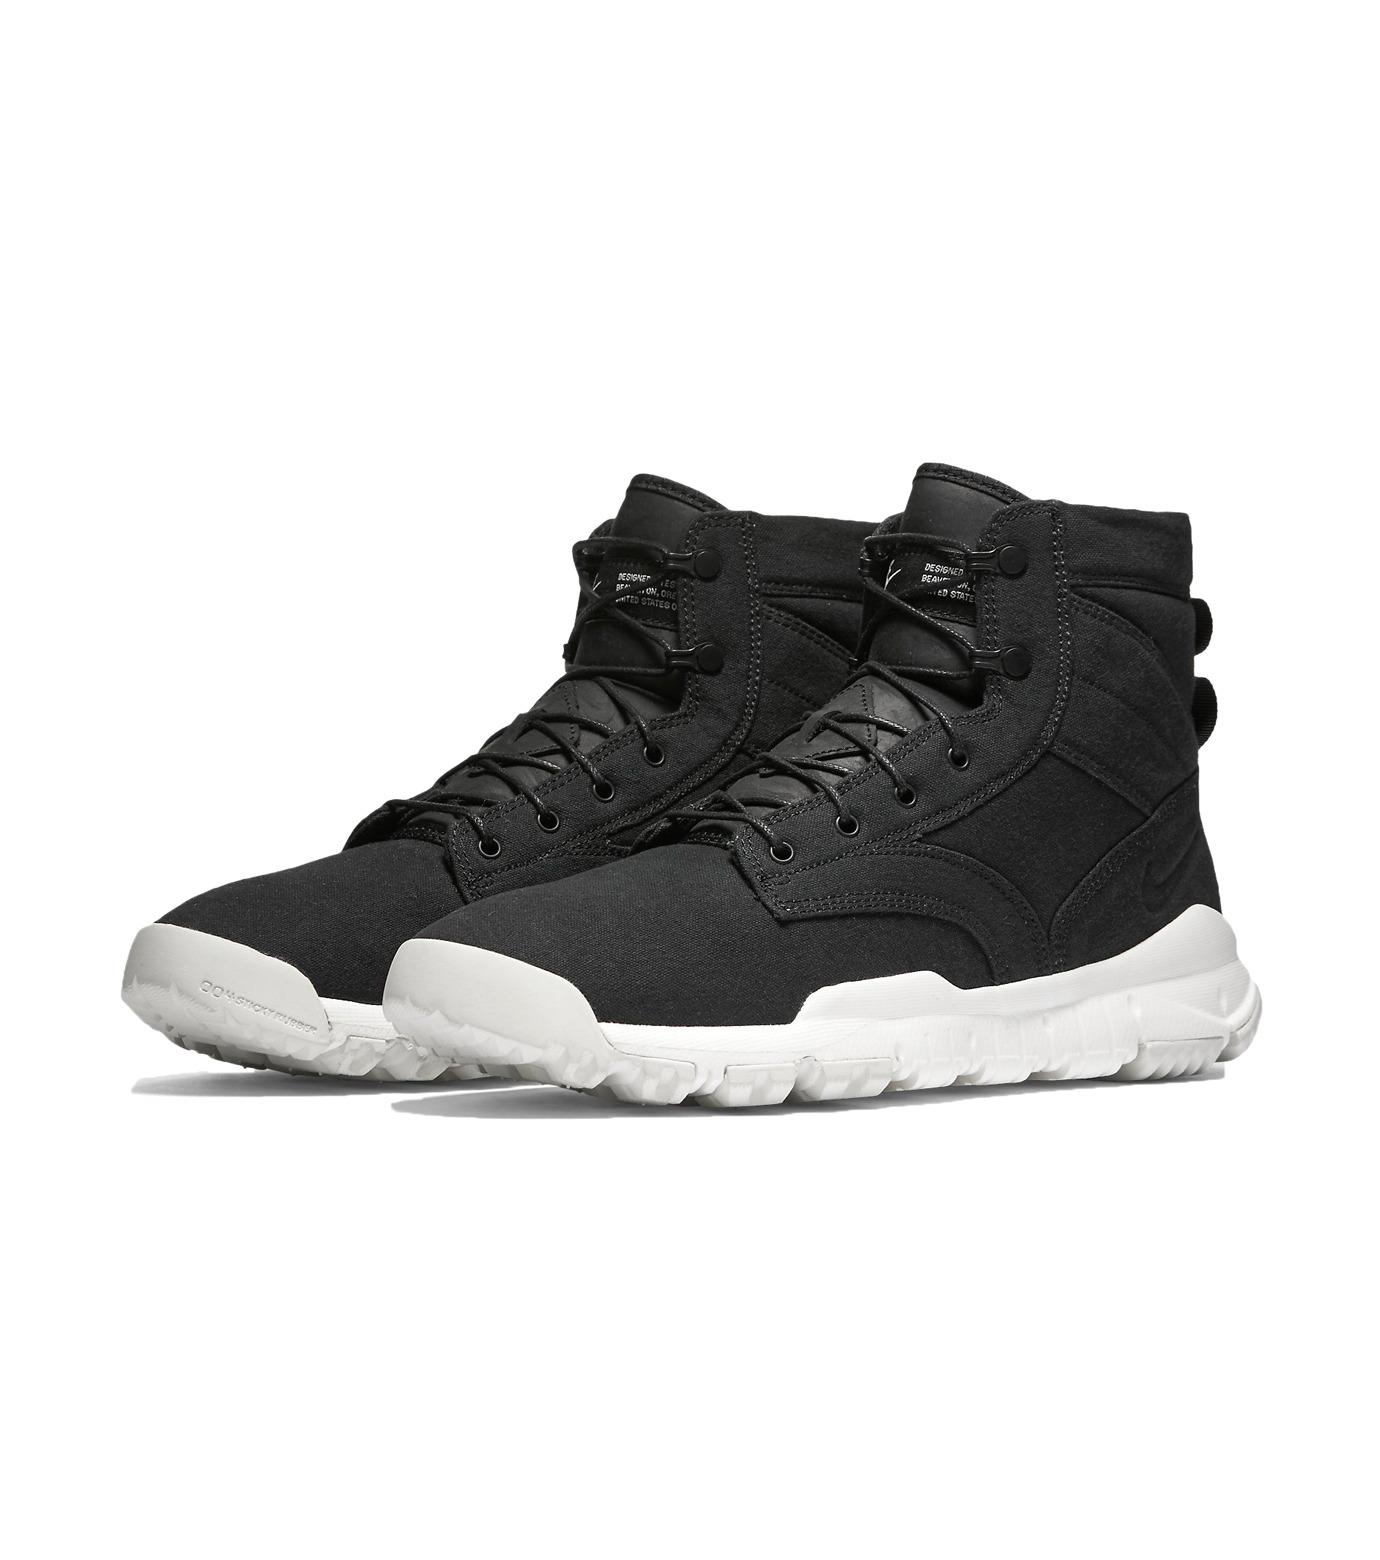 NIKE(ナイキ)のSFB FIELD 6 CANVAS NSW-BLACK(シューズ/shoes)-844577-001-13 拡大詳細画像3